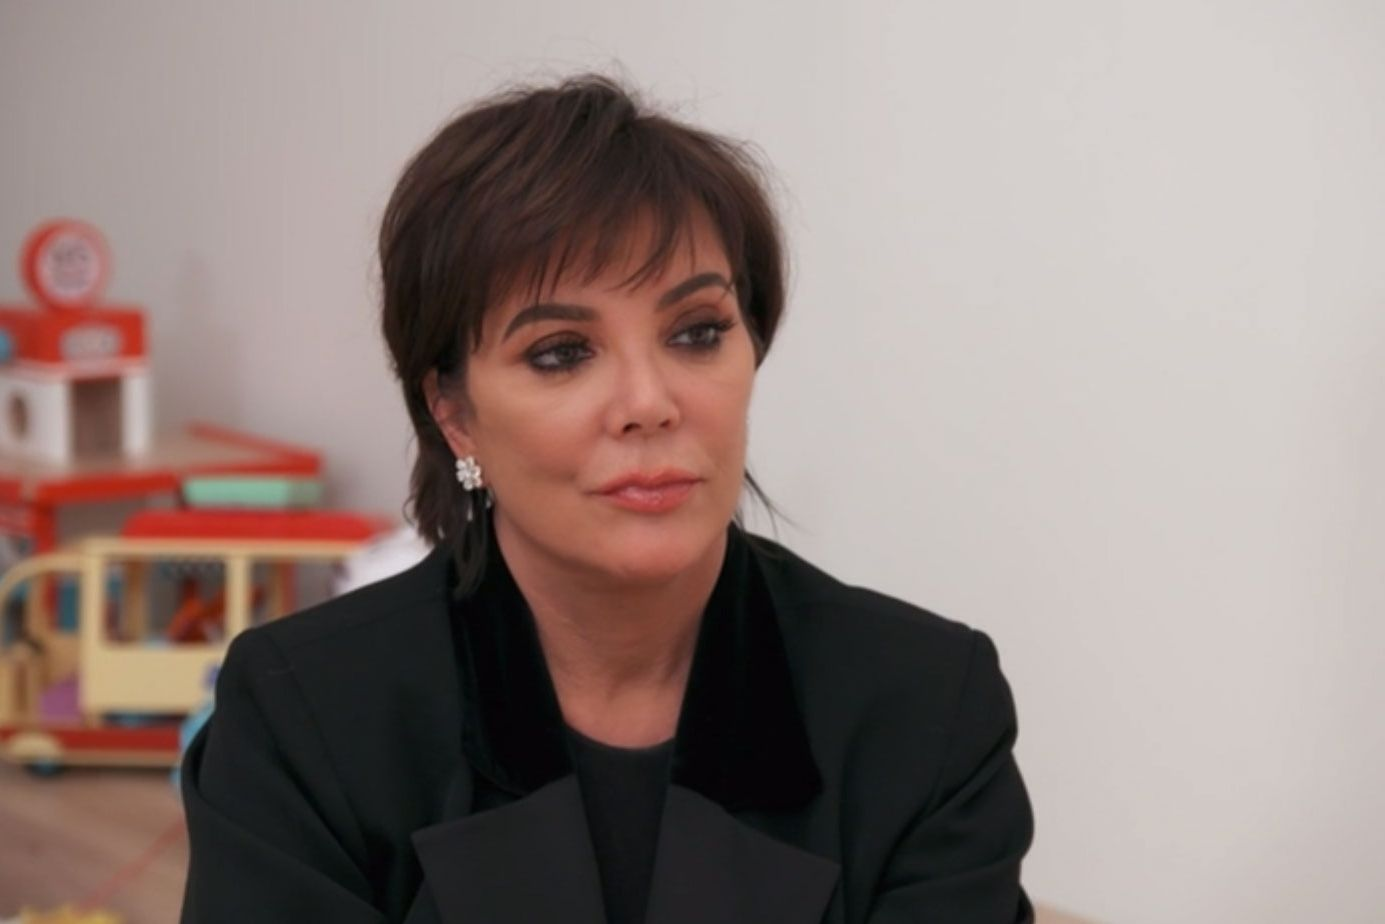 Kris Jenner's Boyfriend Has Thoughts About Monica Lewinsky